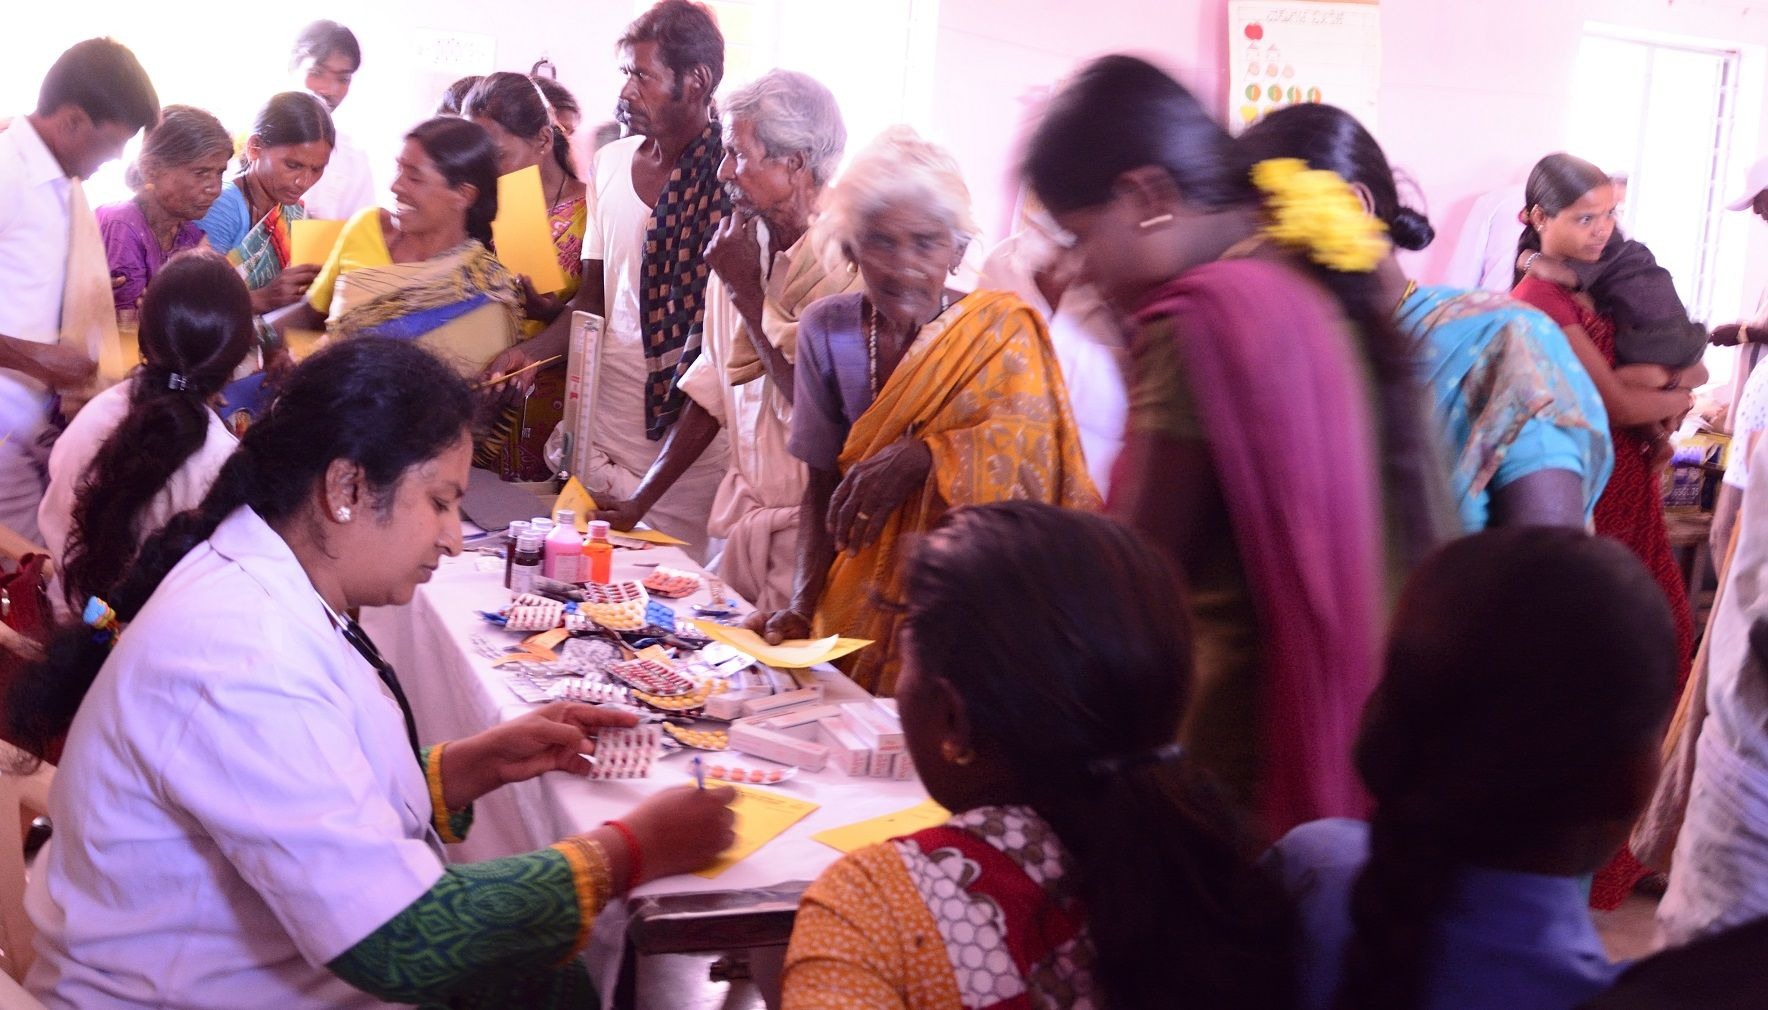 Community health camp in india csr publichealth